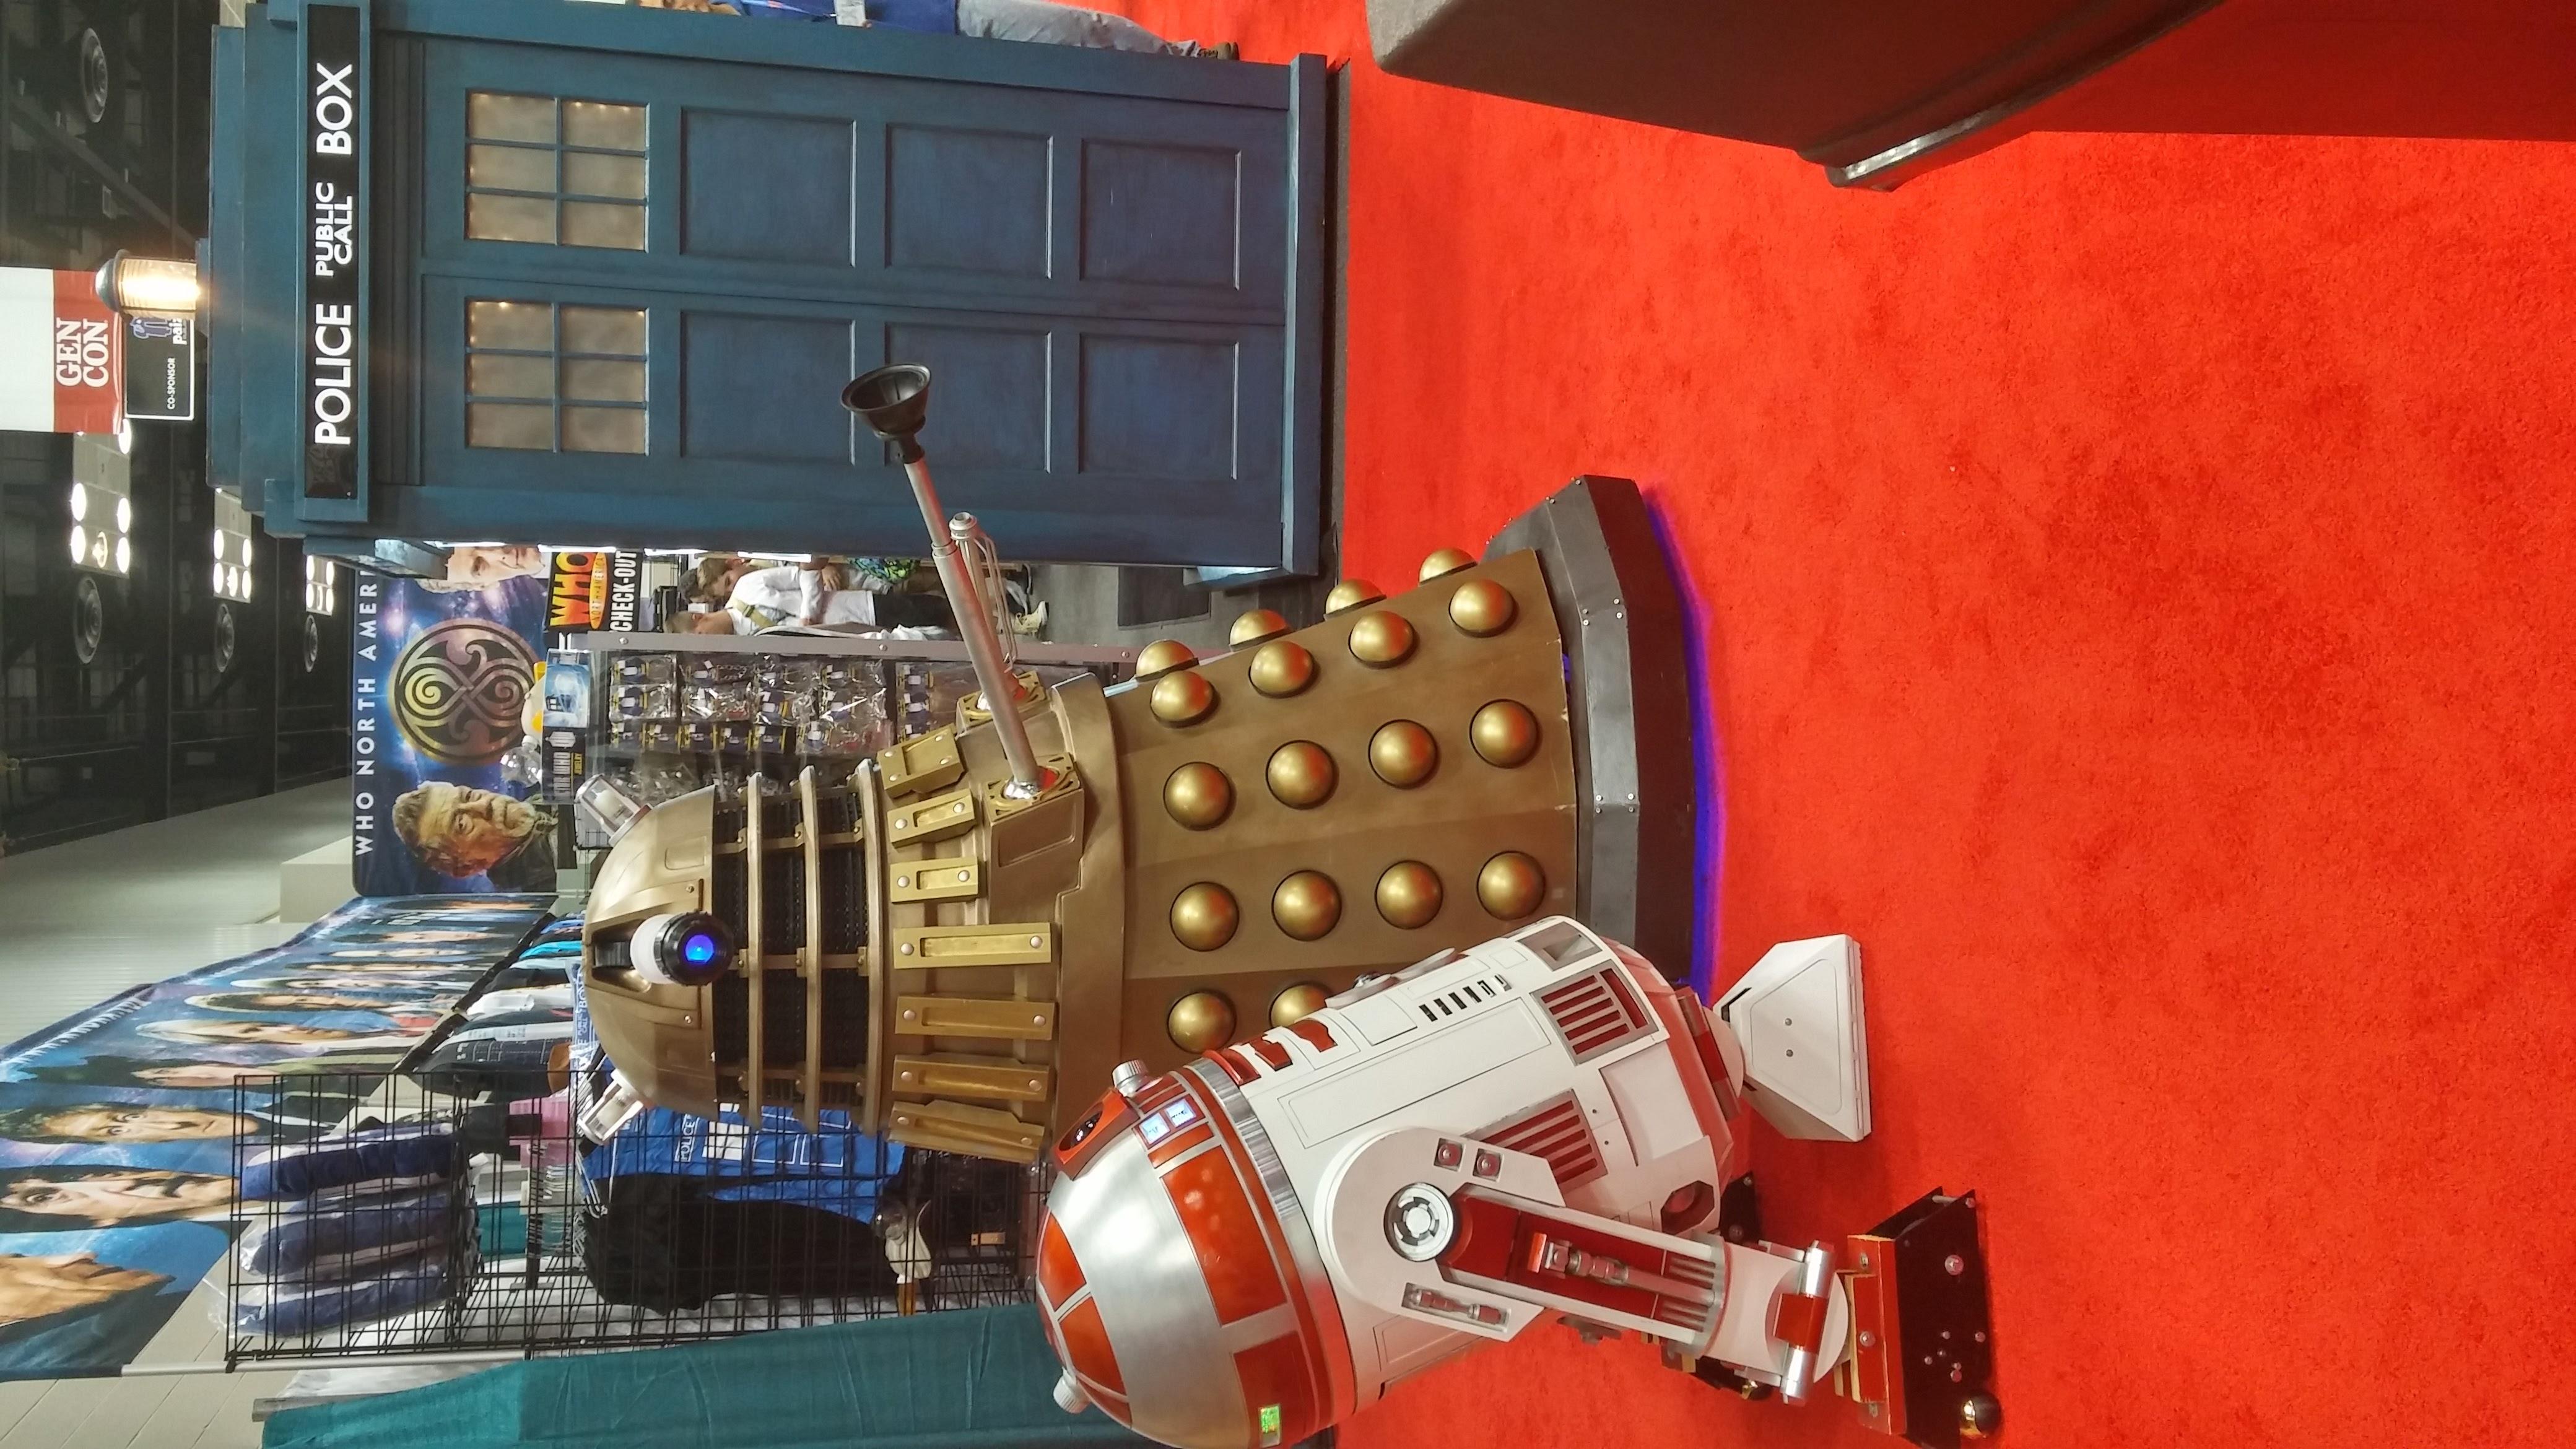 Dalek meets R2